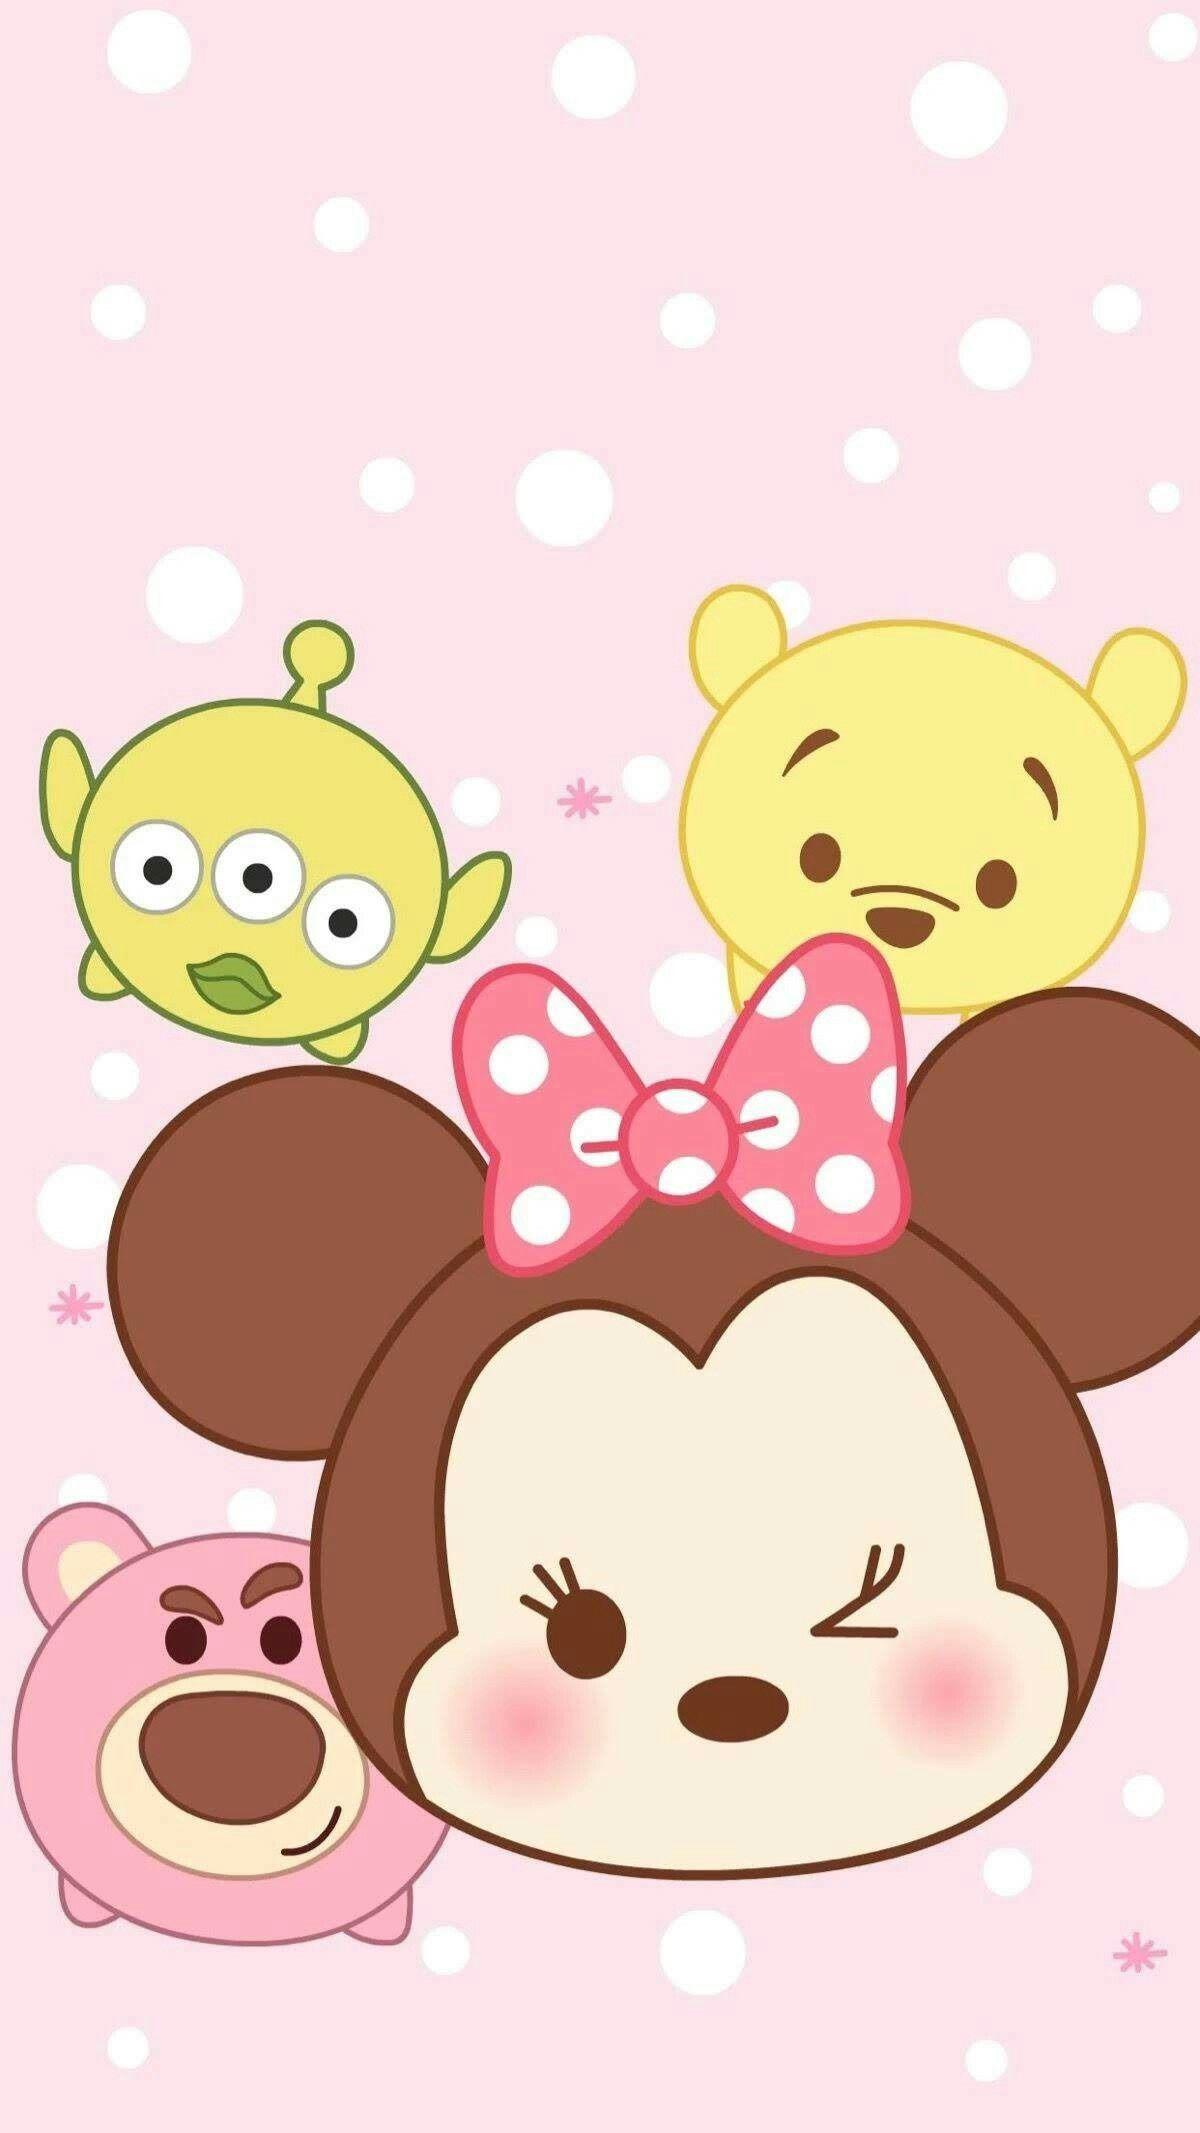 Tsum Tsum Disney Wallpaper Cute Disney Wallpaper Tsum Tsum Wallpaper